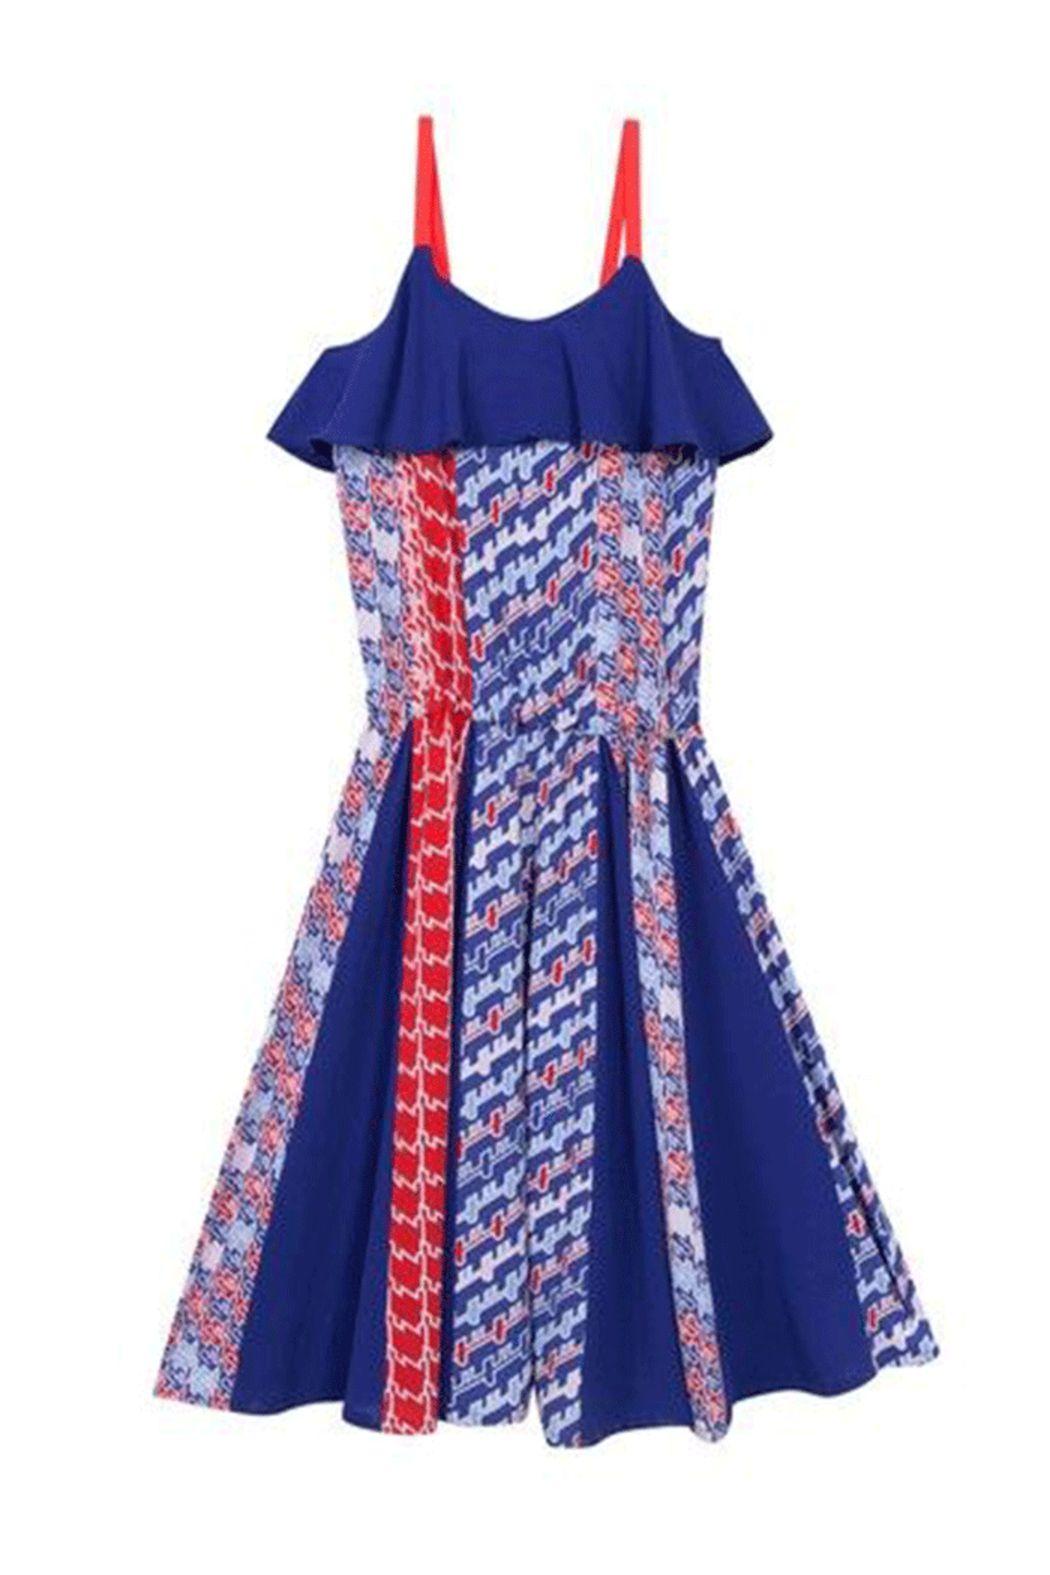 1f7e30fe30 Kenzo Balzane Print Dress from New York City by Mon Petit